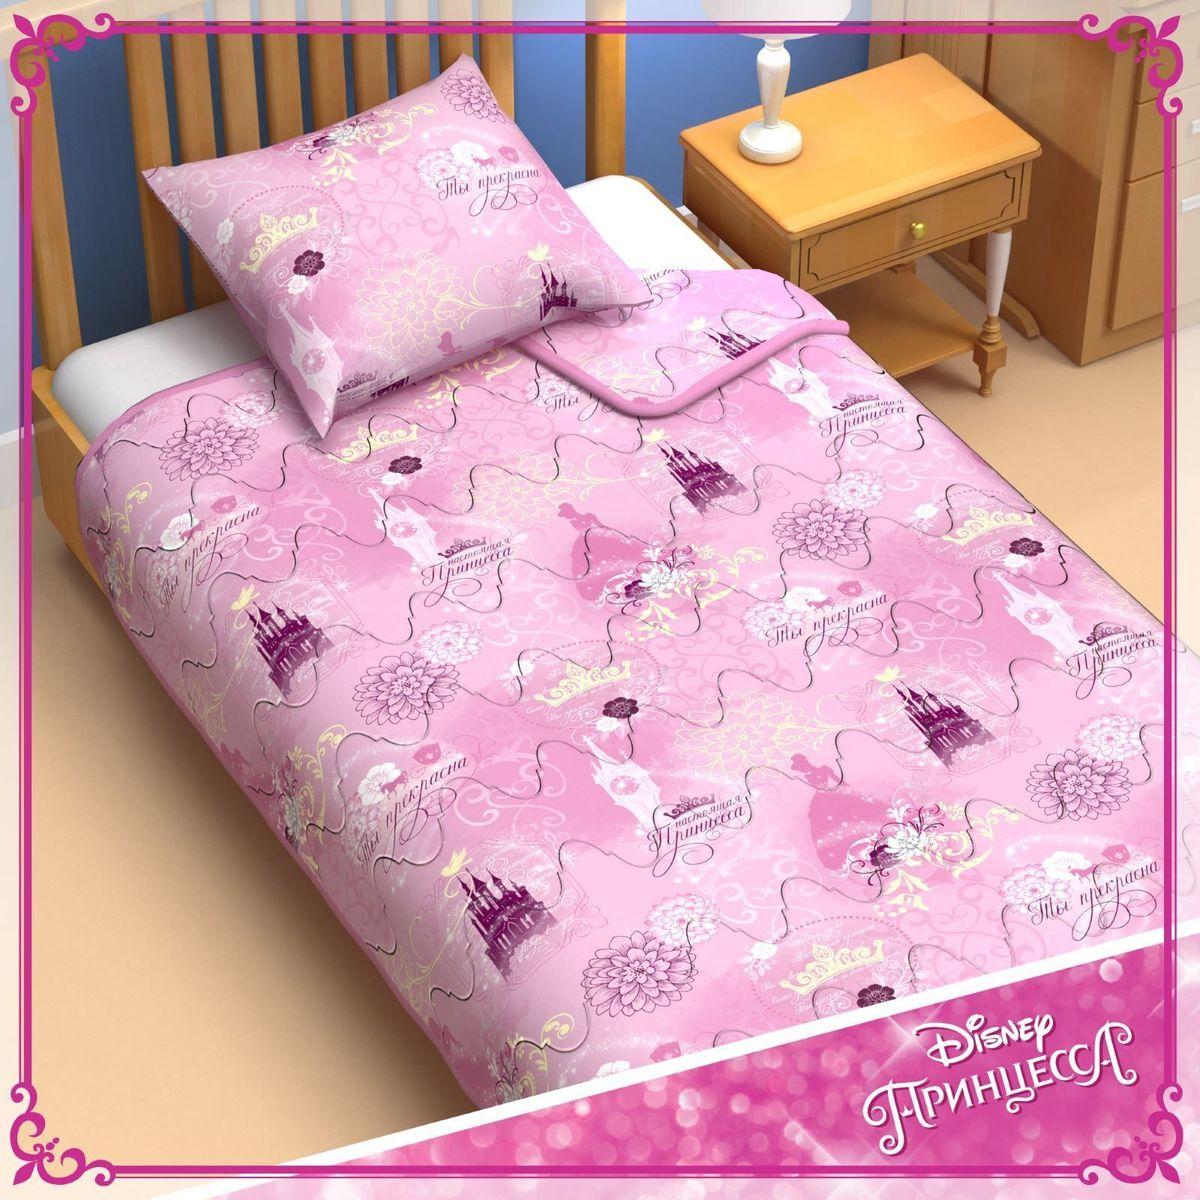 Disney Одеяло 1,5 спальное Принцессы 140 х 205 см 1153169